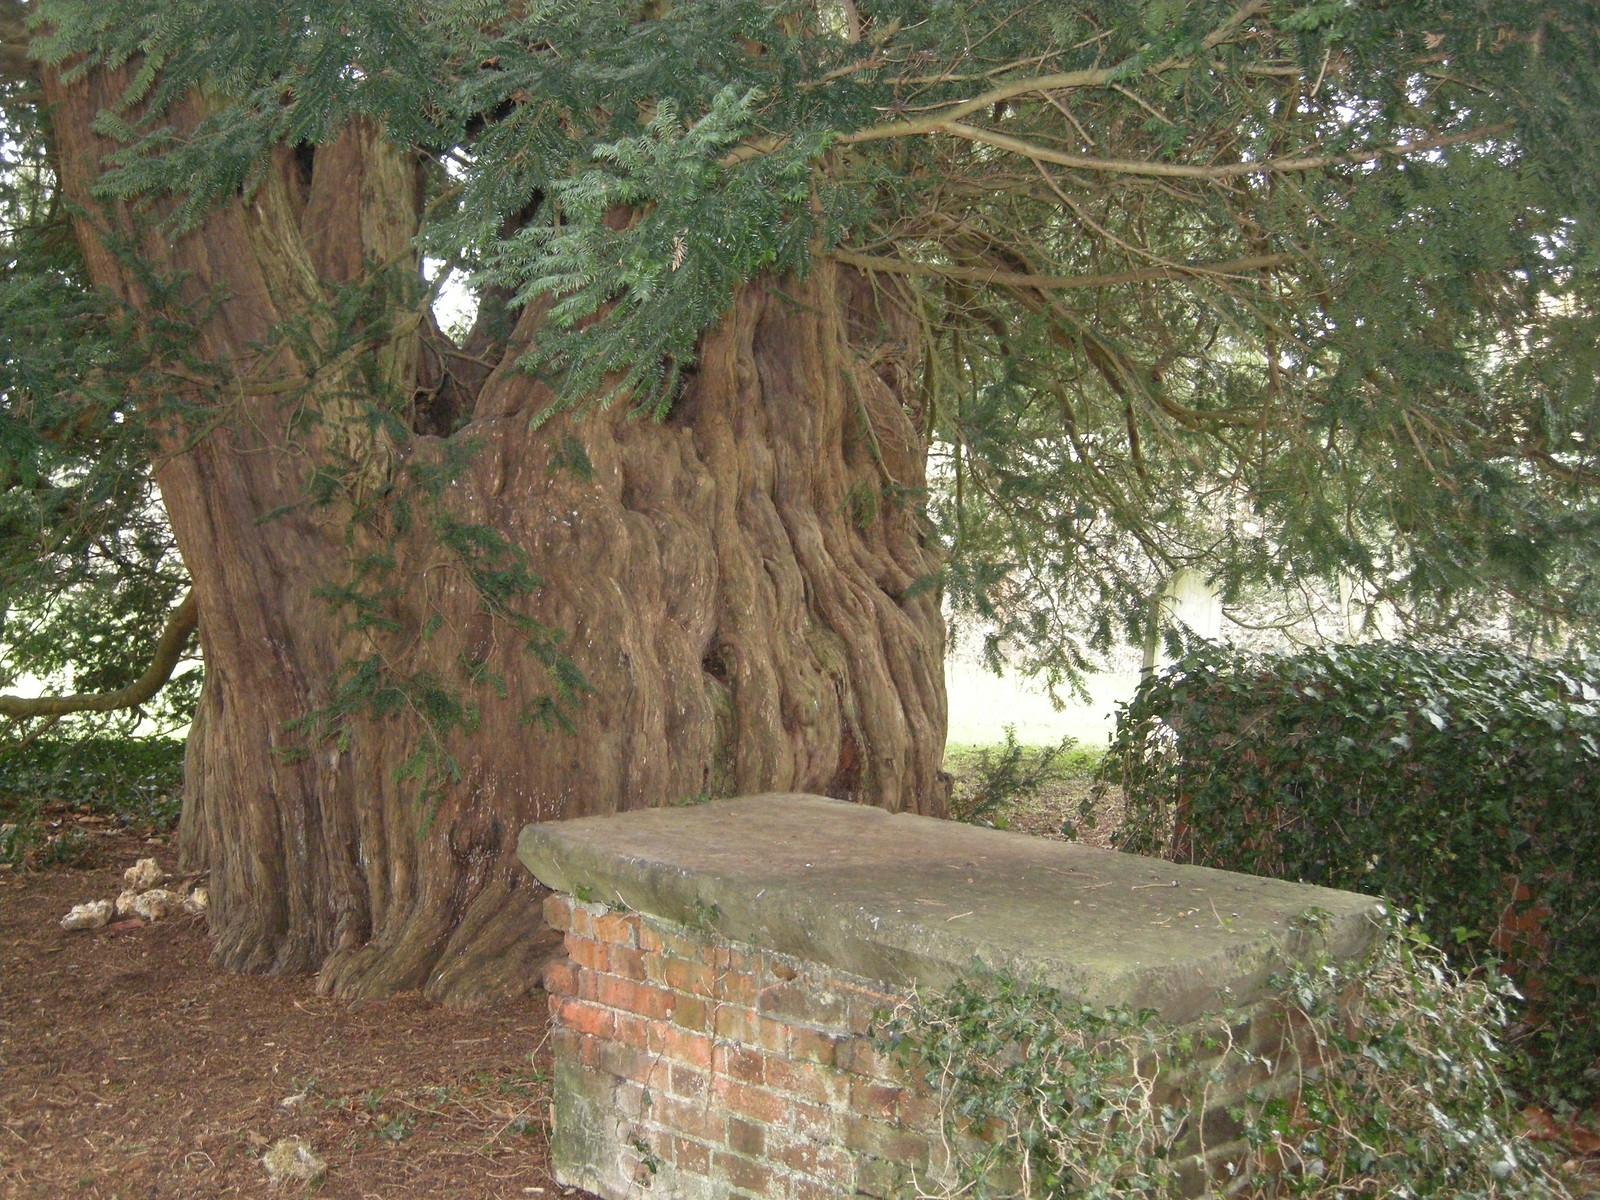 Cudham trees